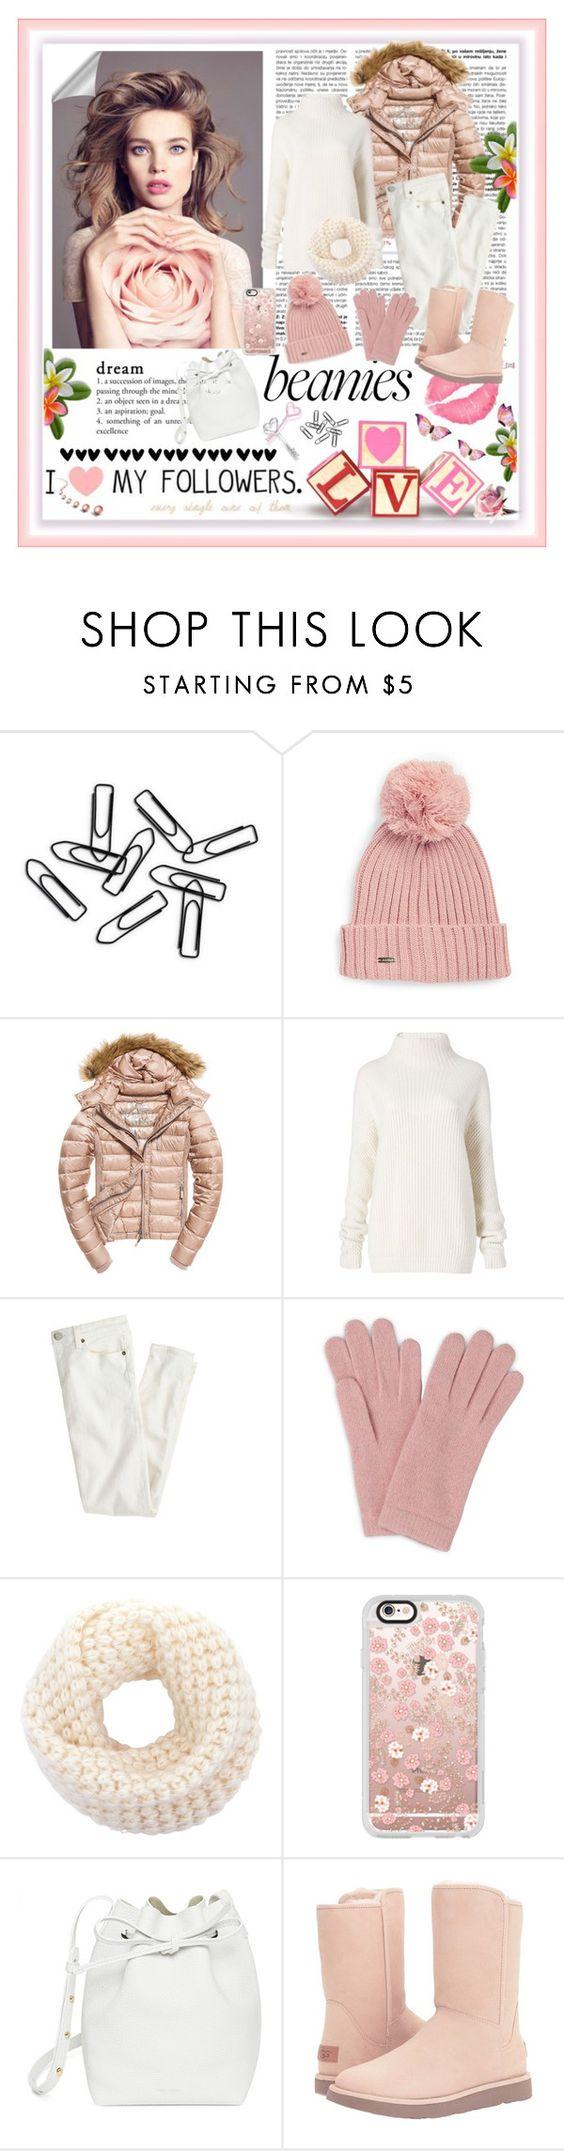 """Beanies...Sweet Pink"" by marina-class ❤ liked on Polyvore featuring Calvin Klein, Fuji, Diane Von Furstenberg, J.Crew, L.K.Bennett, Casetify, Mansur Gavriel, UGG, Pink and beanies"